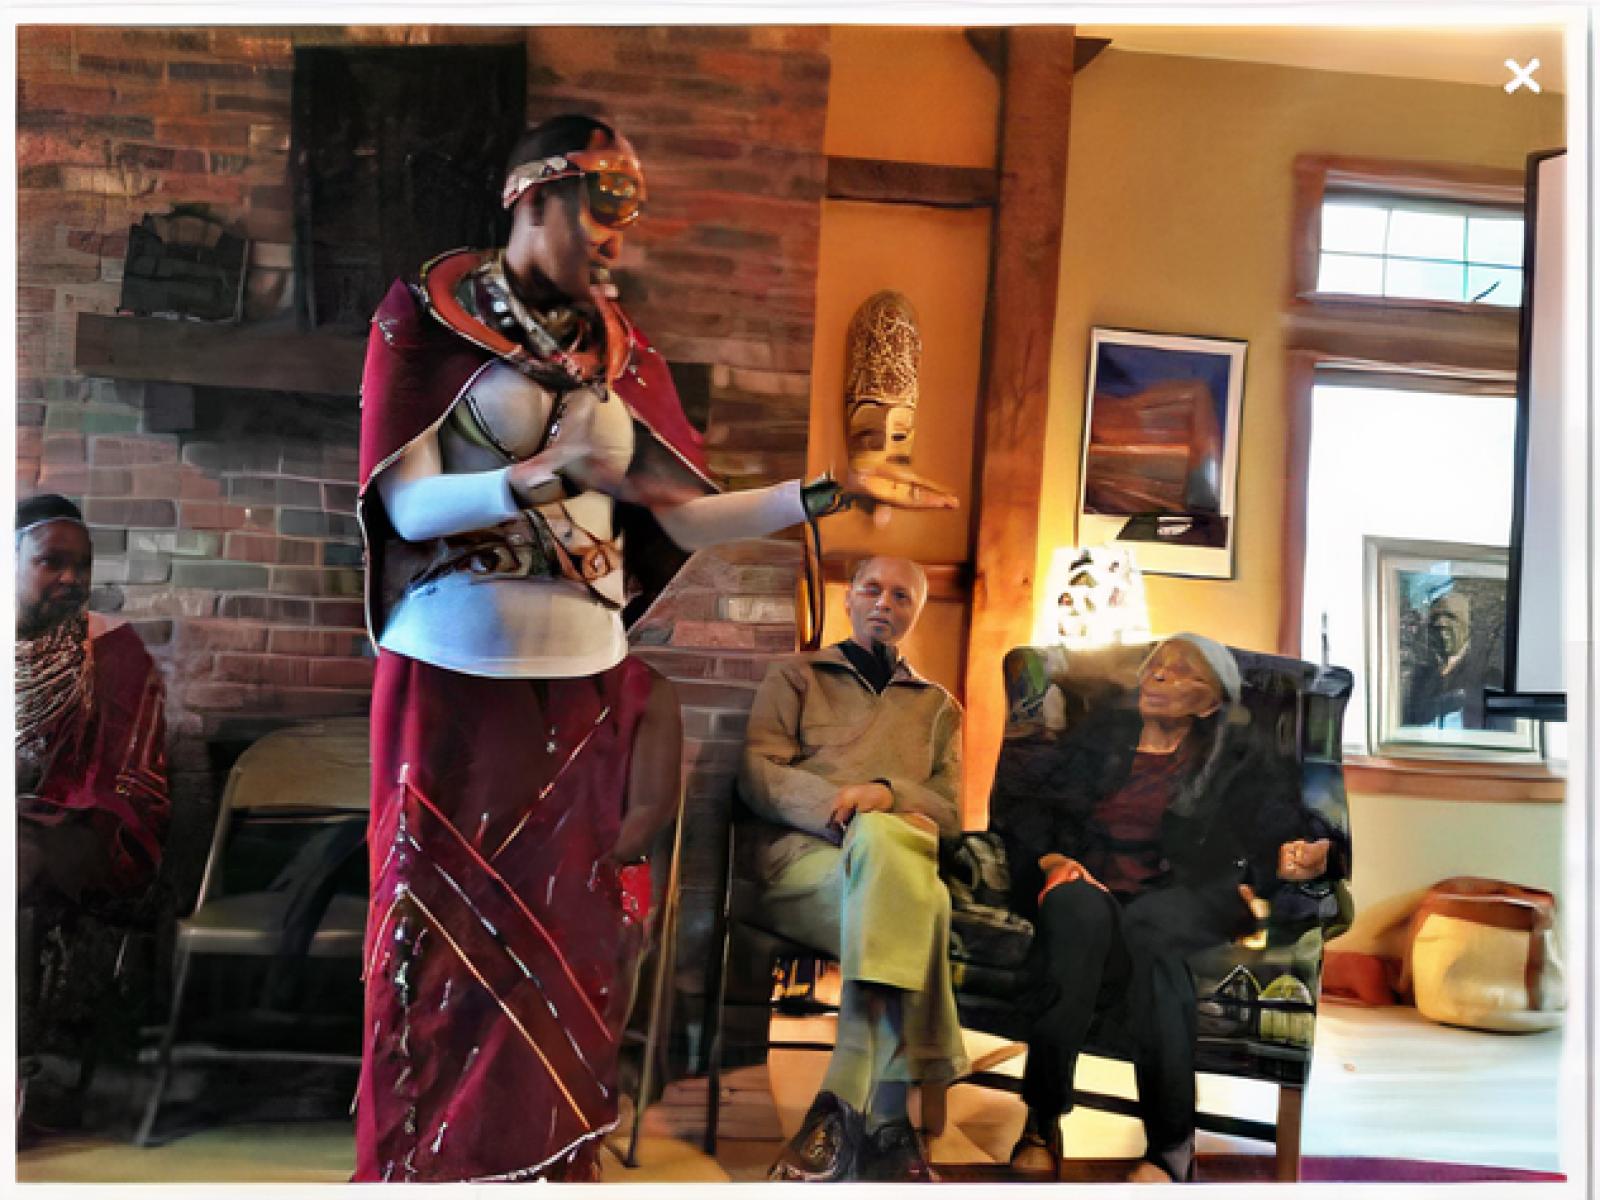 A Maasai storyteller presents a programs to elderly visitors at a farm